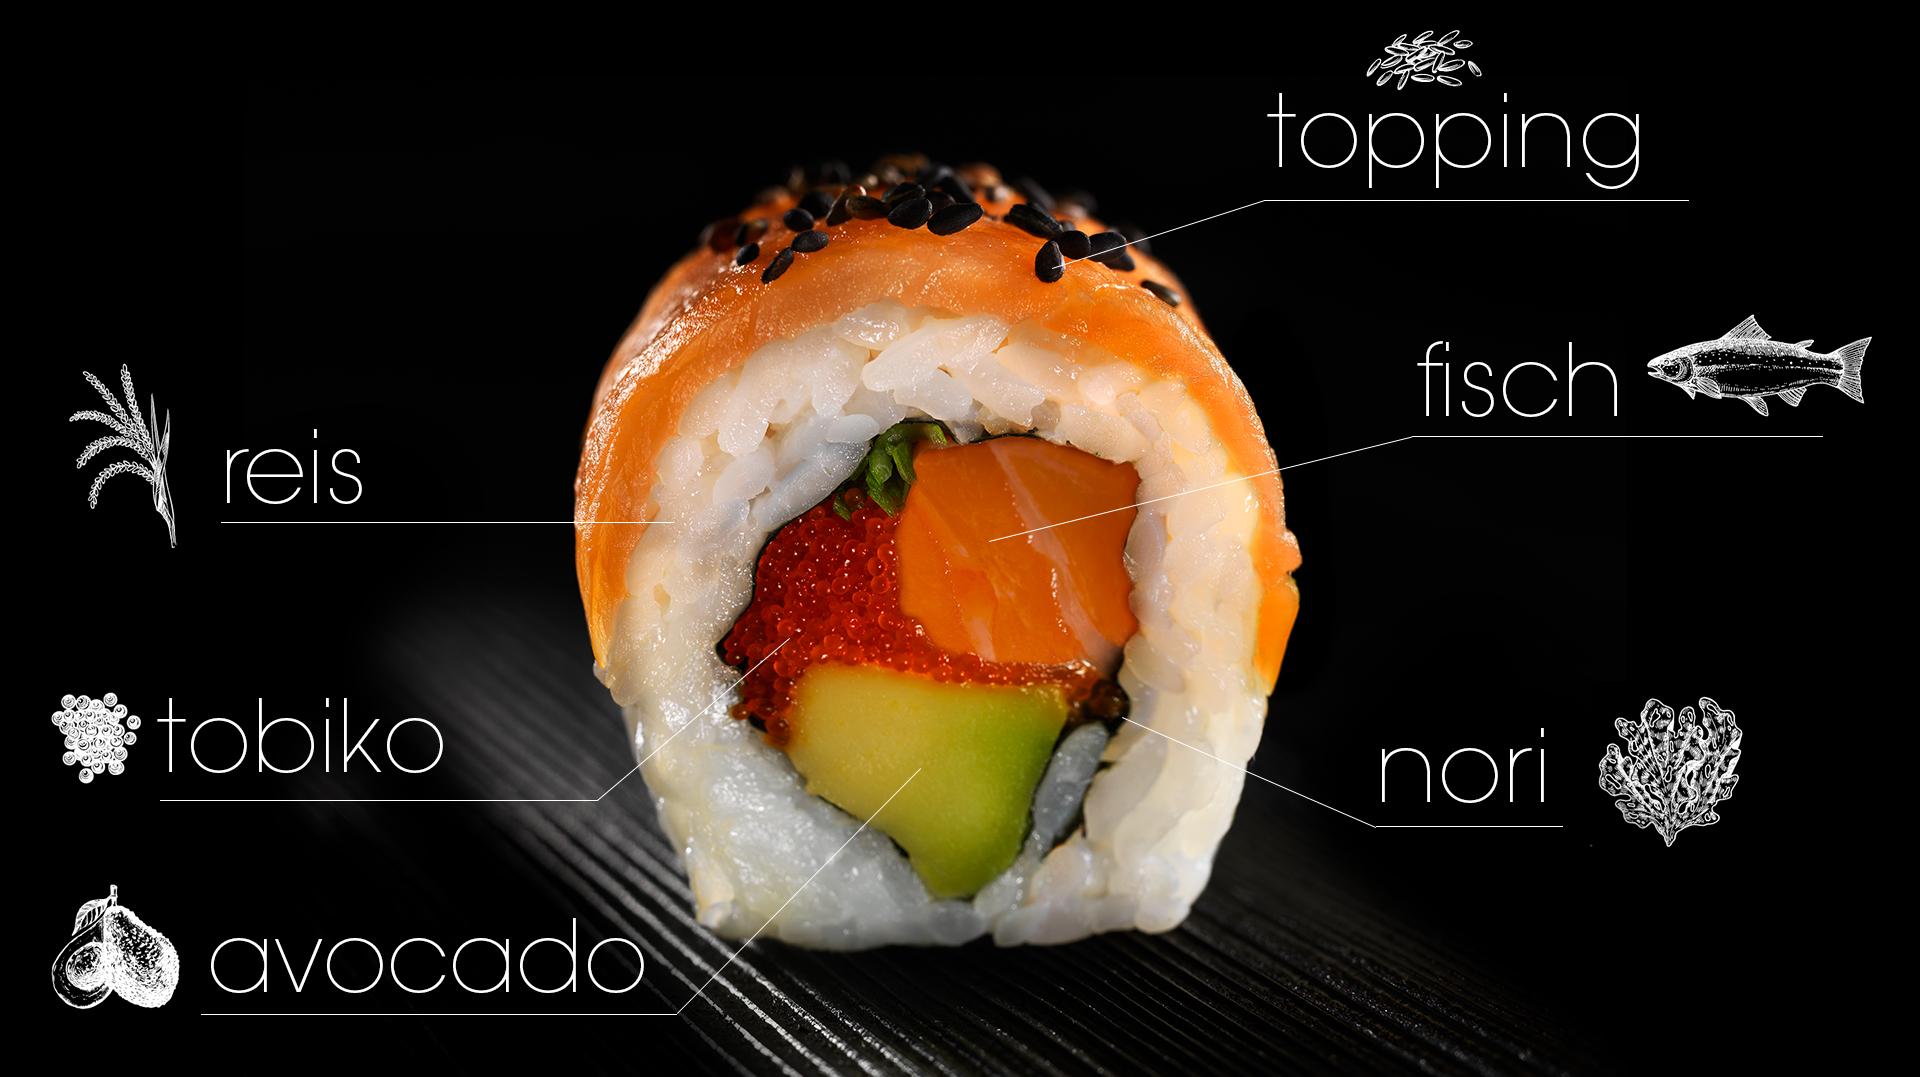 shizoo. Philosophie Sushi Frische Qualität